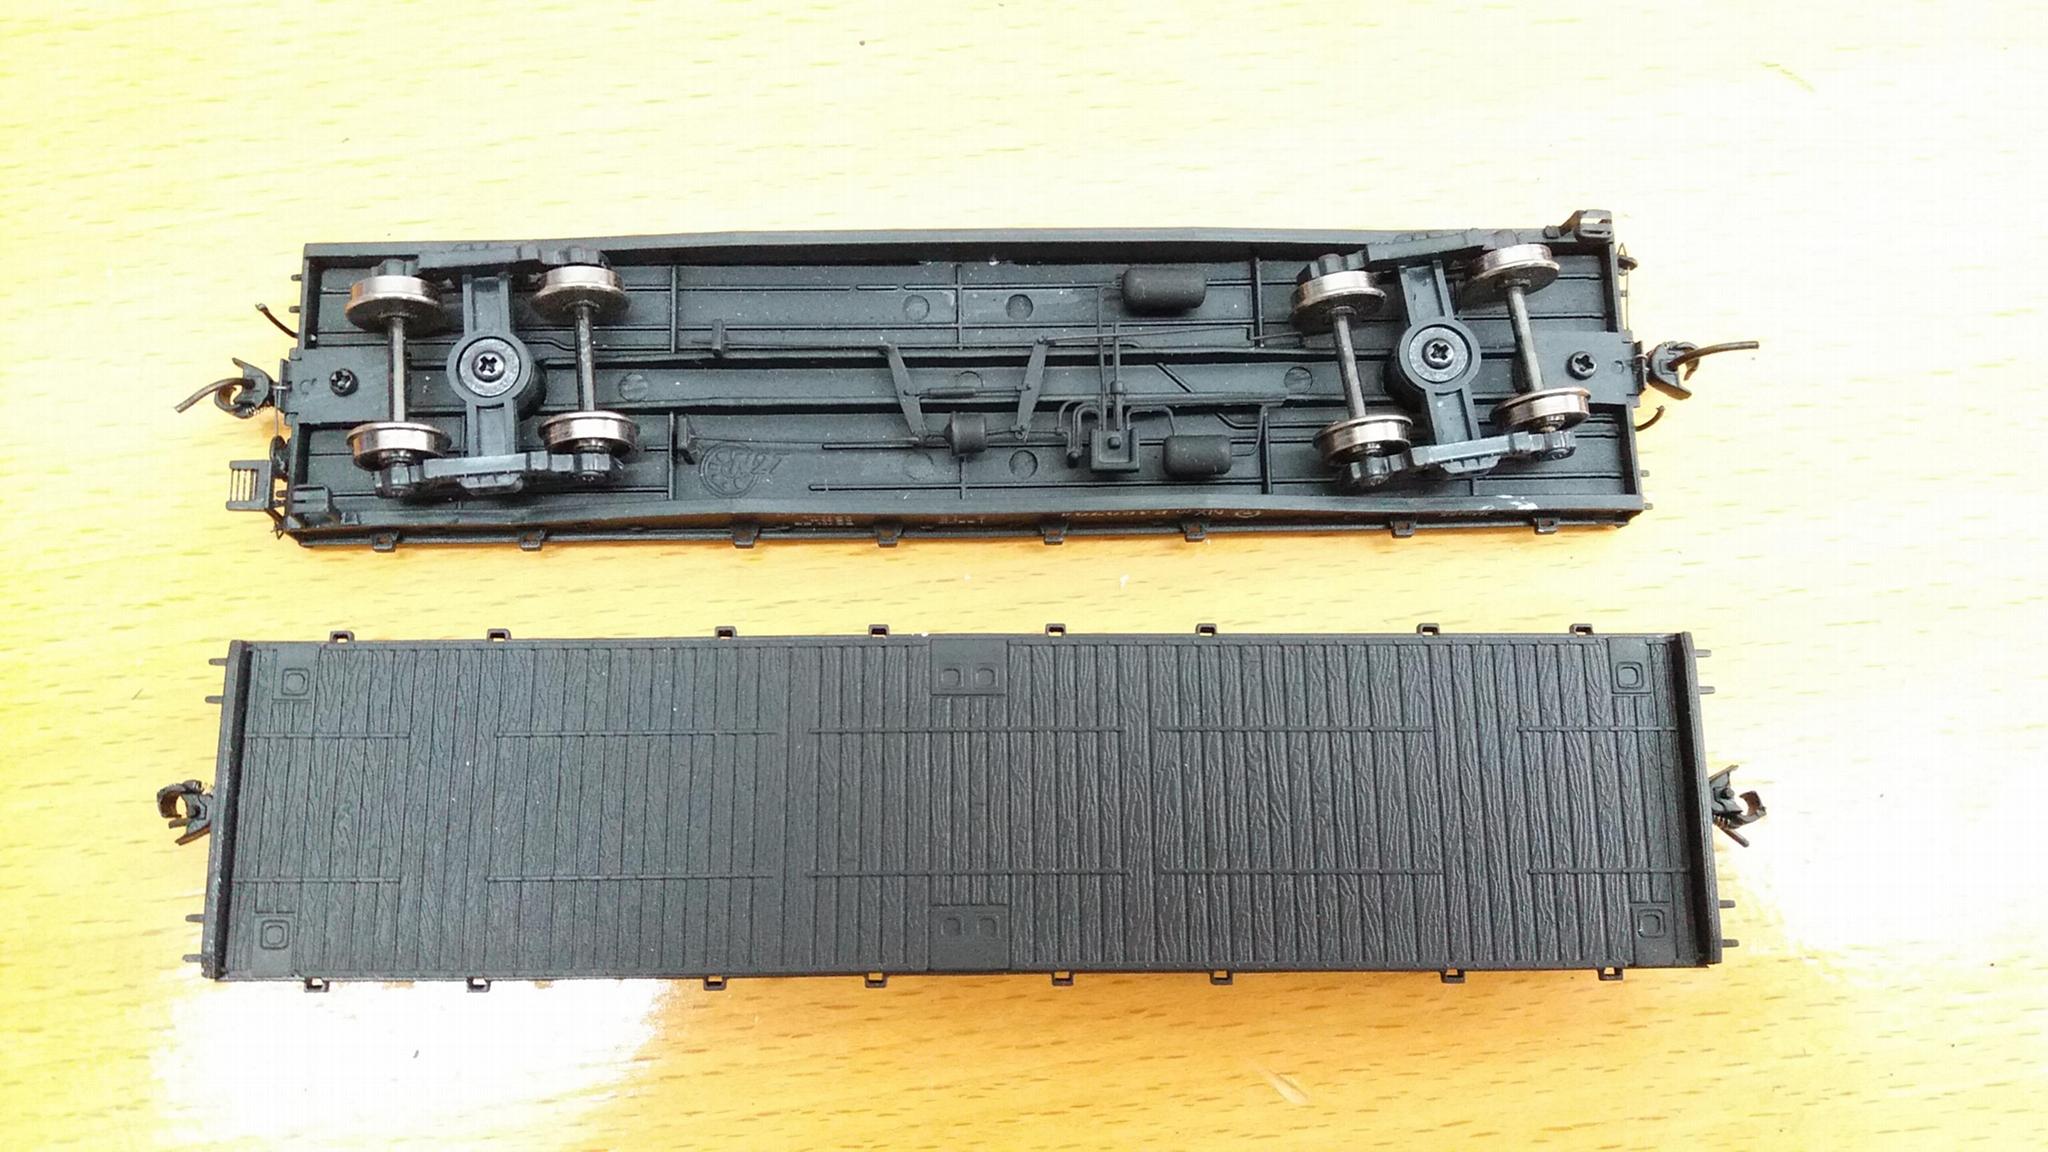 A miniature replica of a railway carriage 1